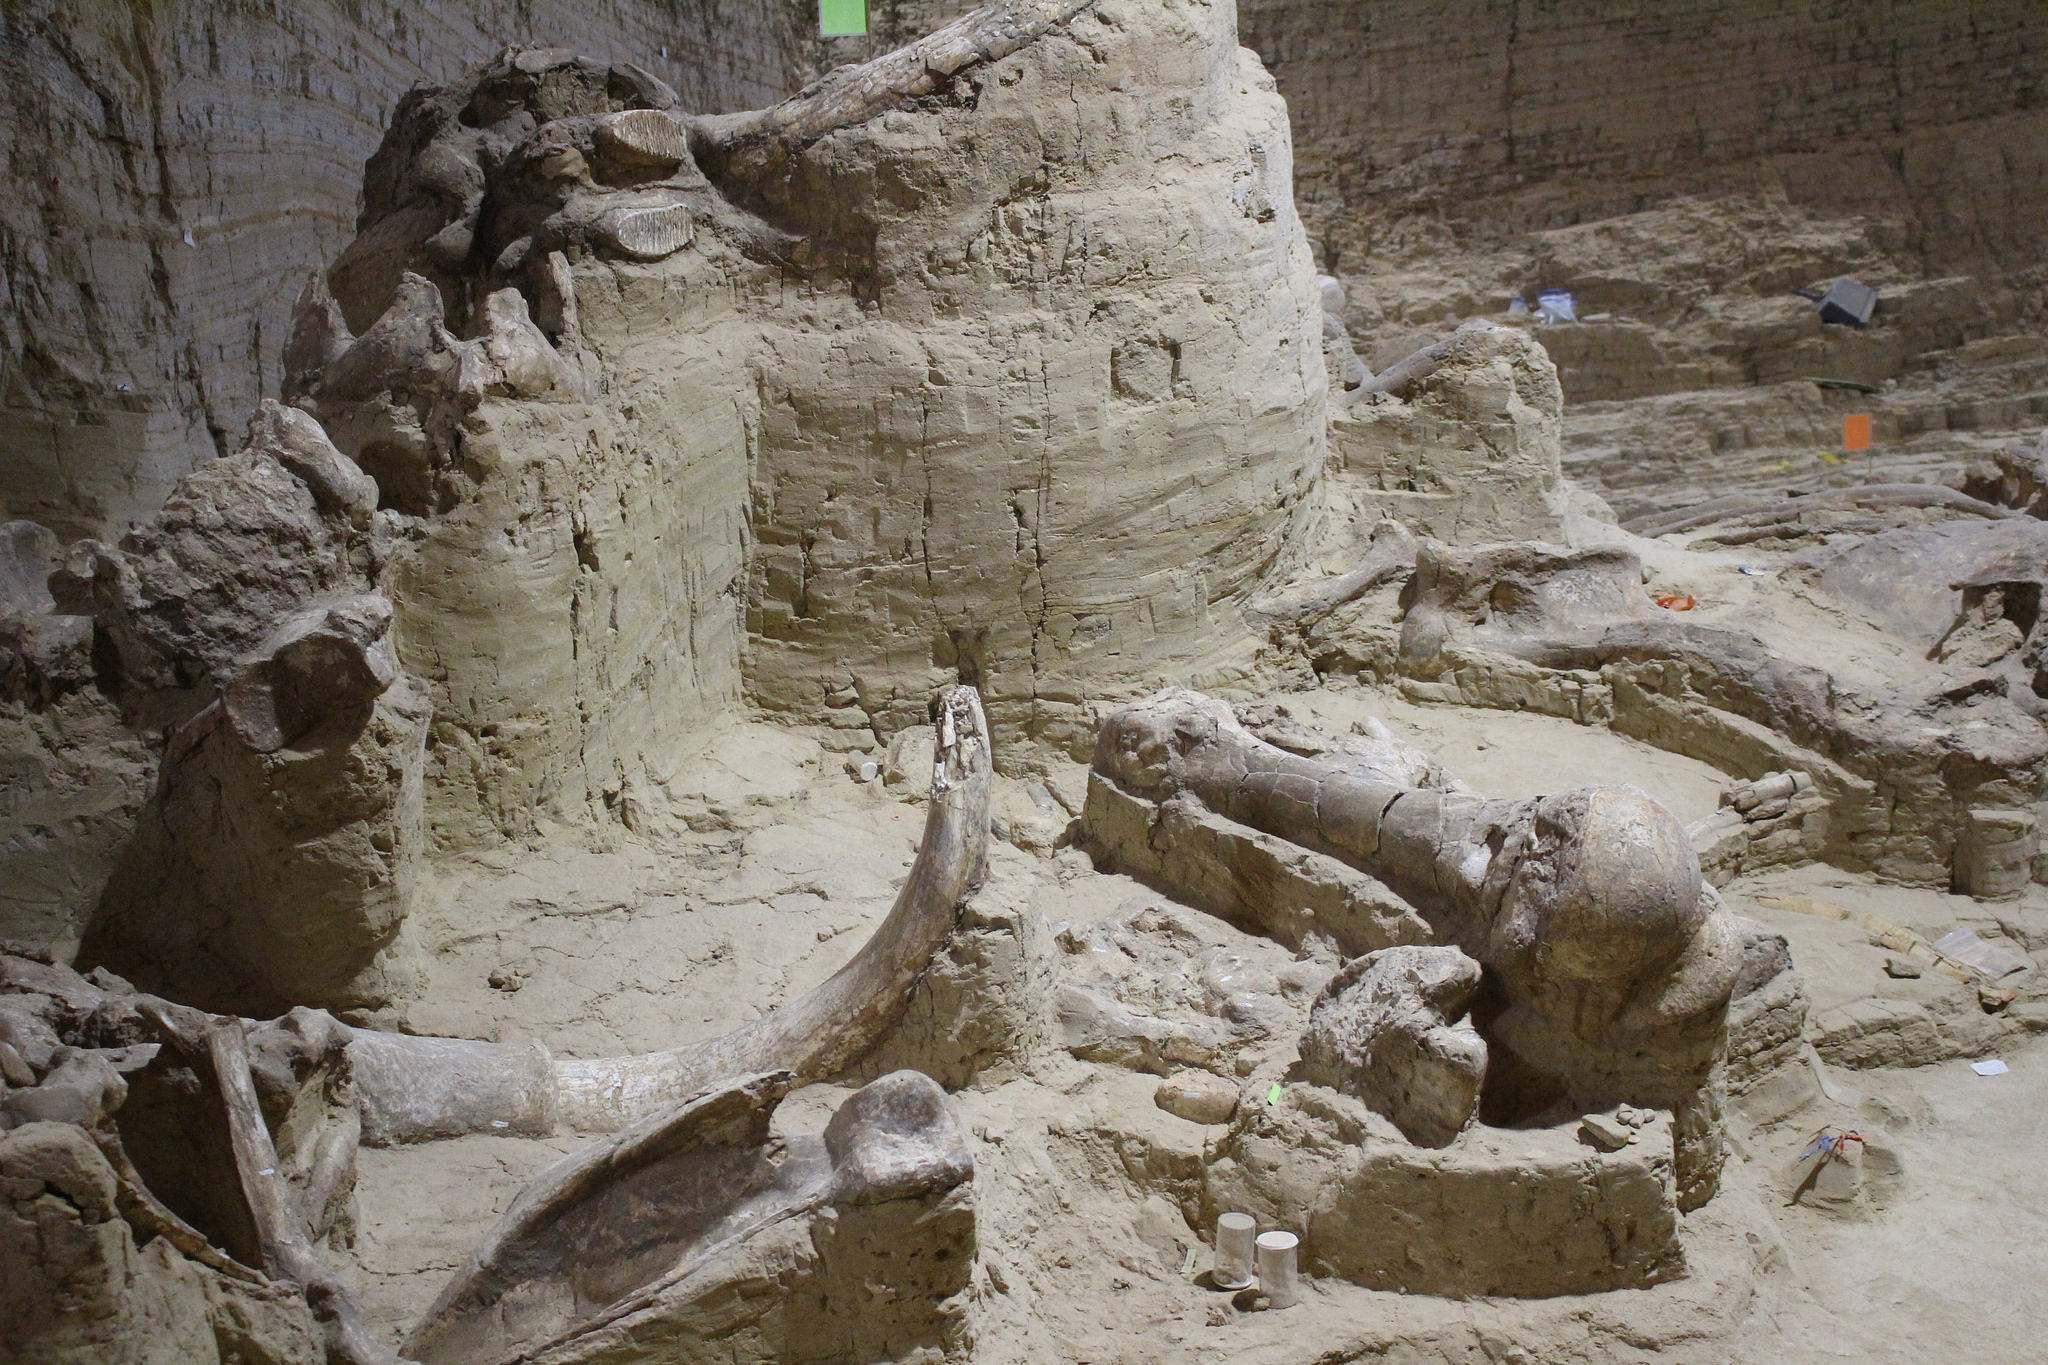 mammoth site2 Mammoth Site of Hot Springs in South Dakota